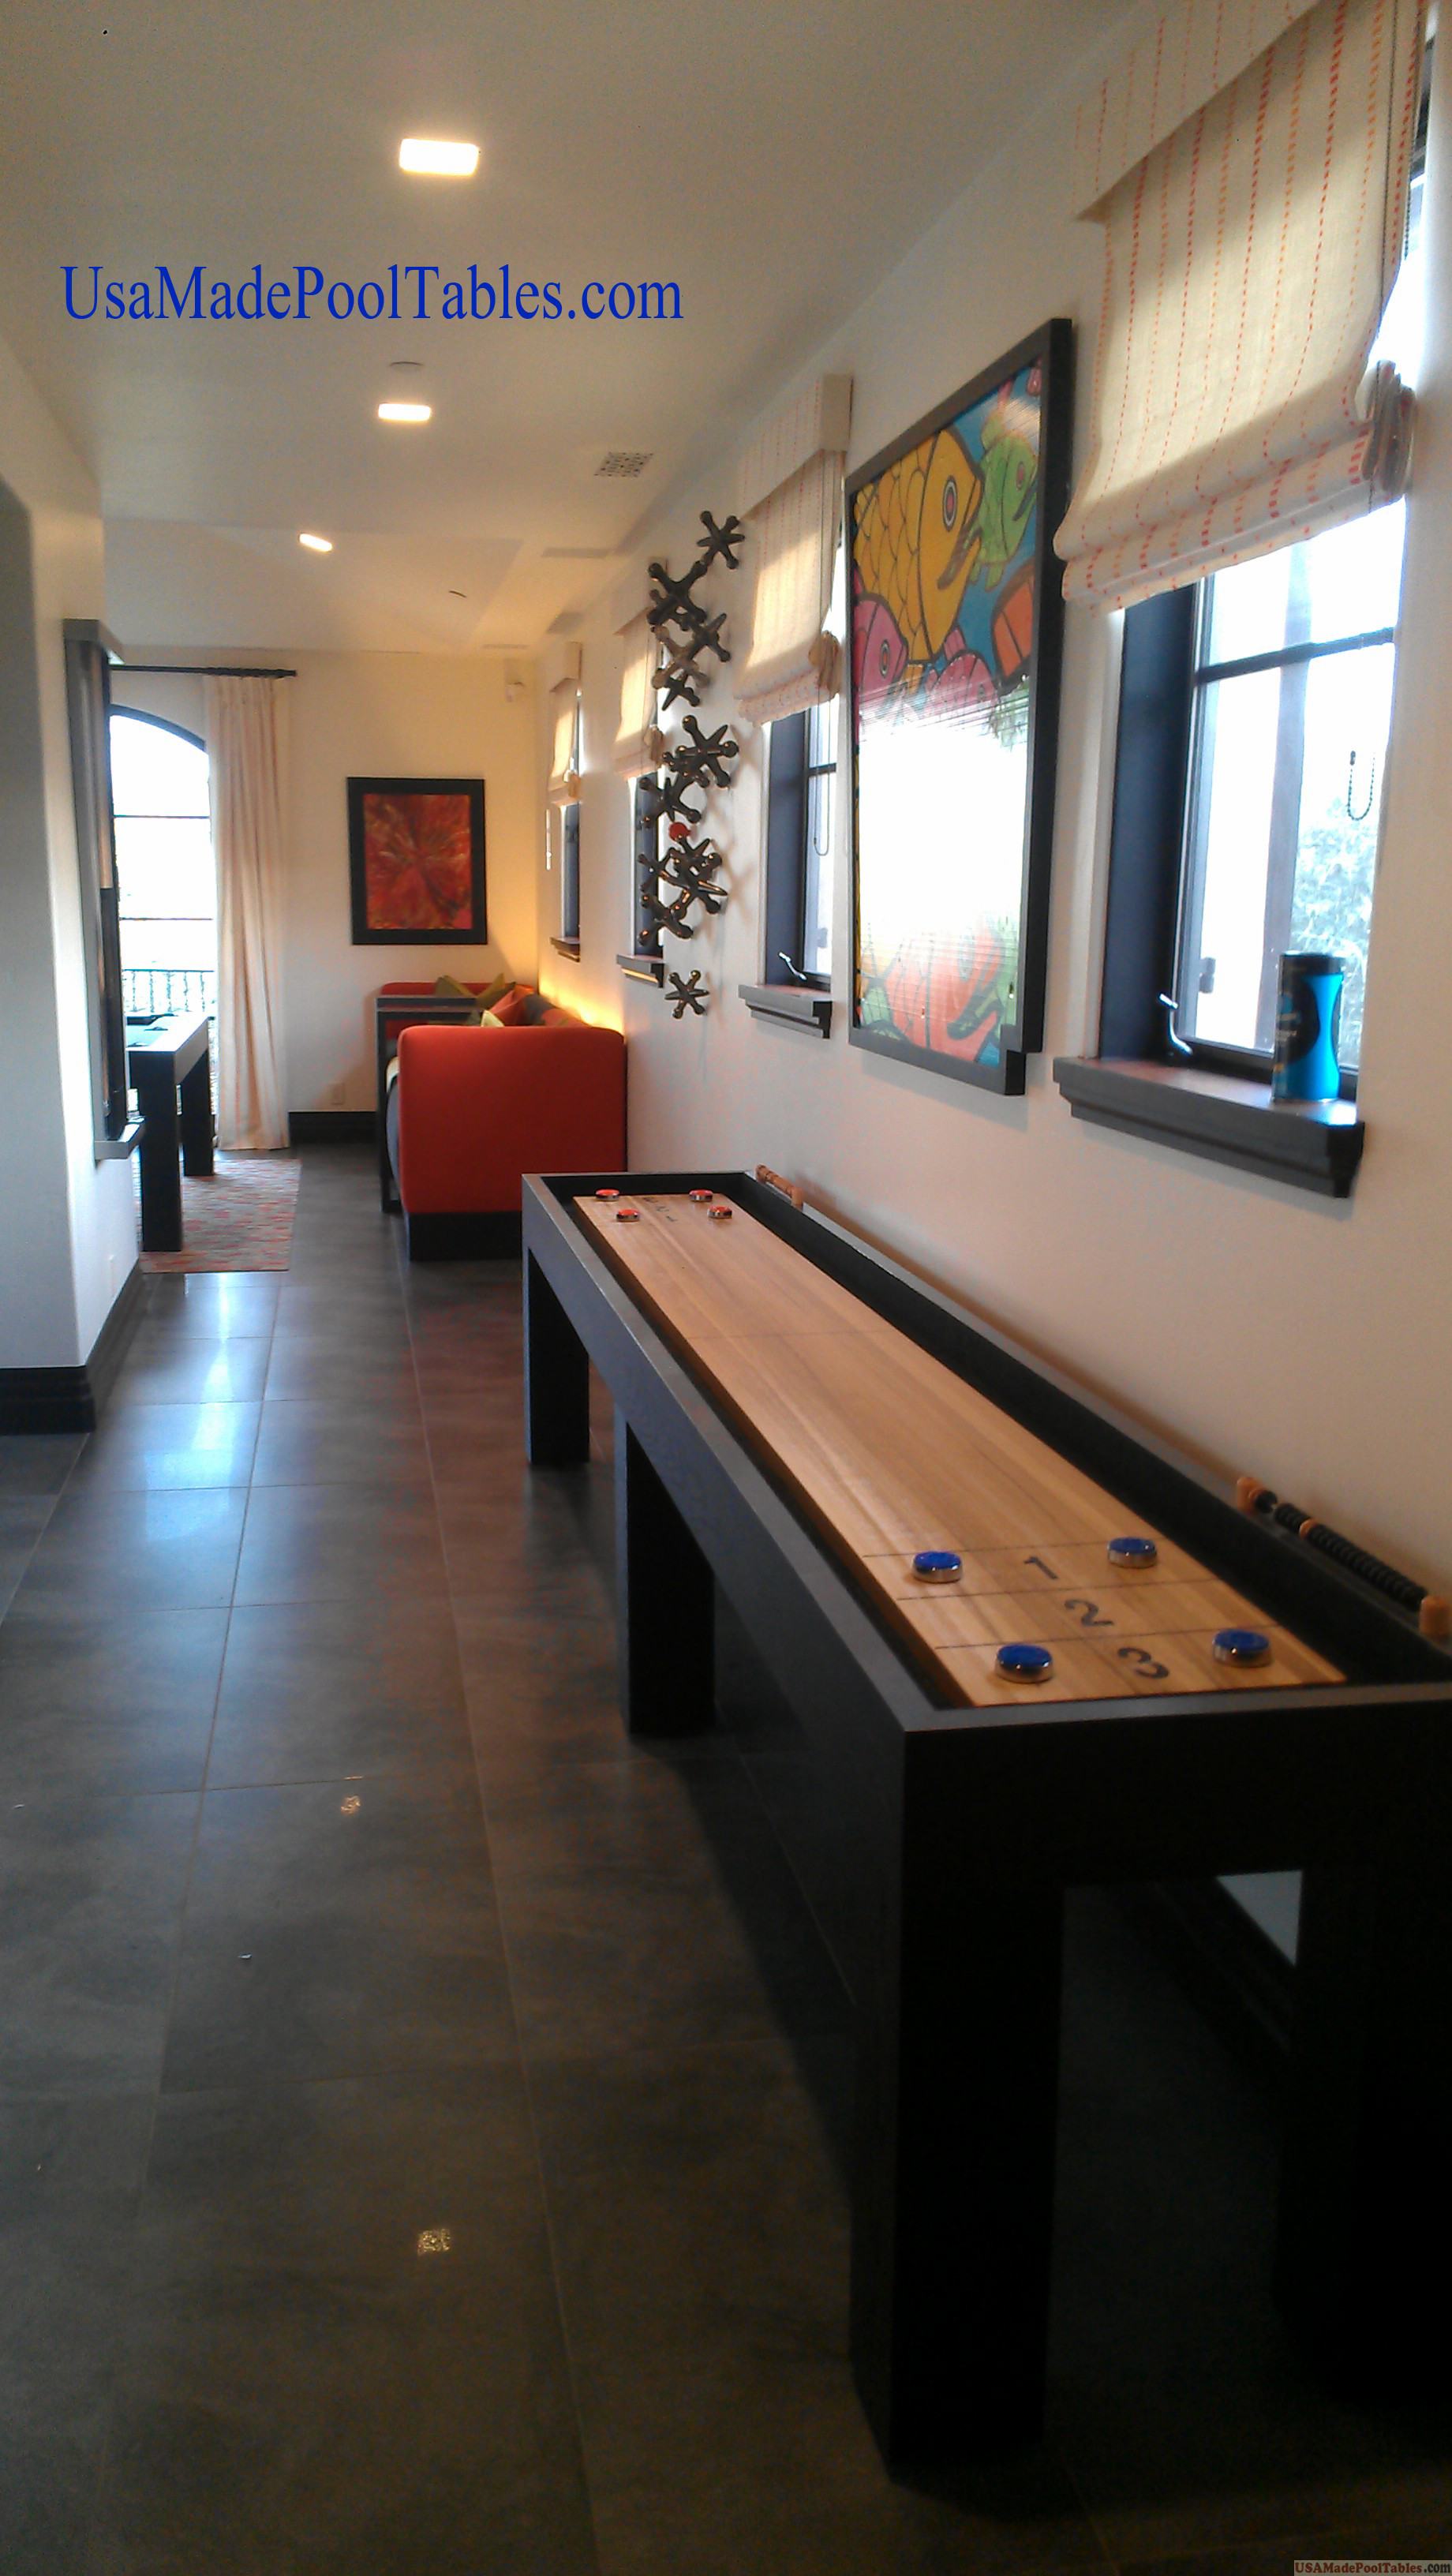 Shuffleboard Table Pool Table Poker Table Air Hockey